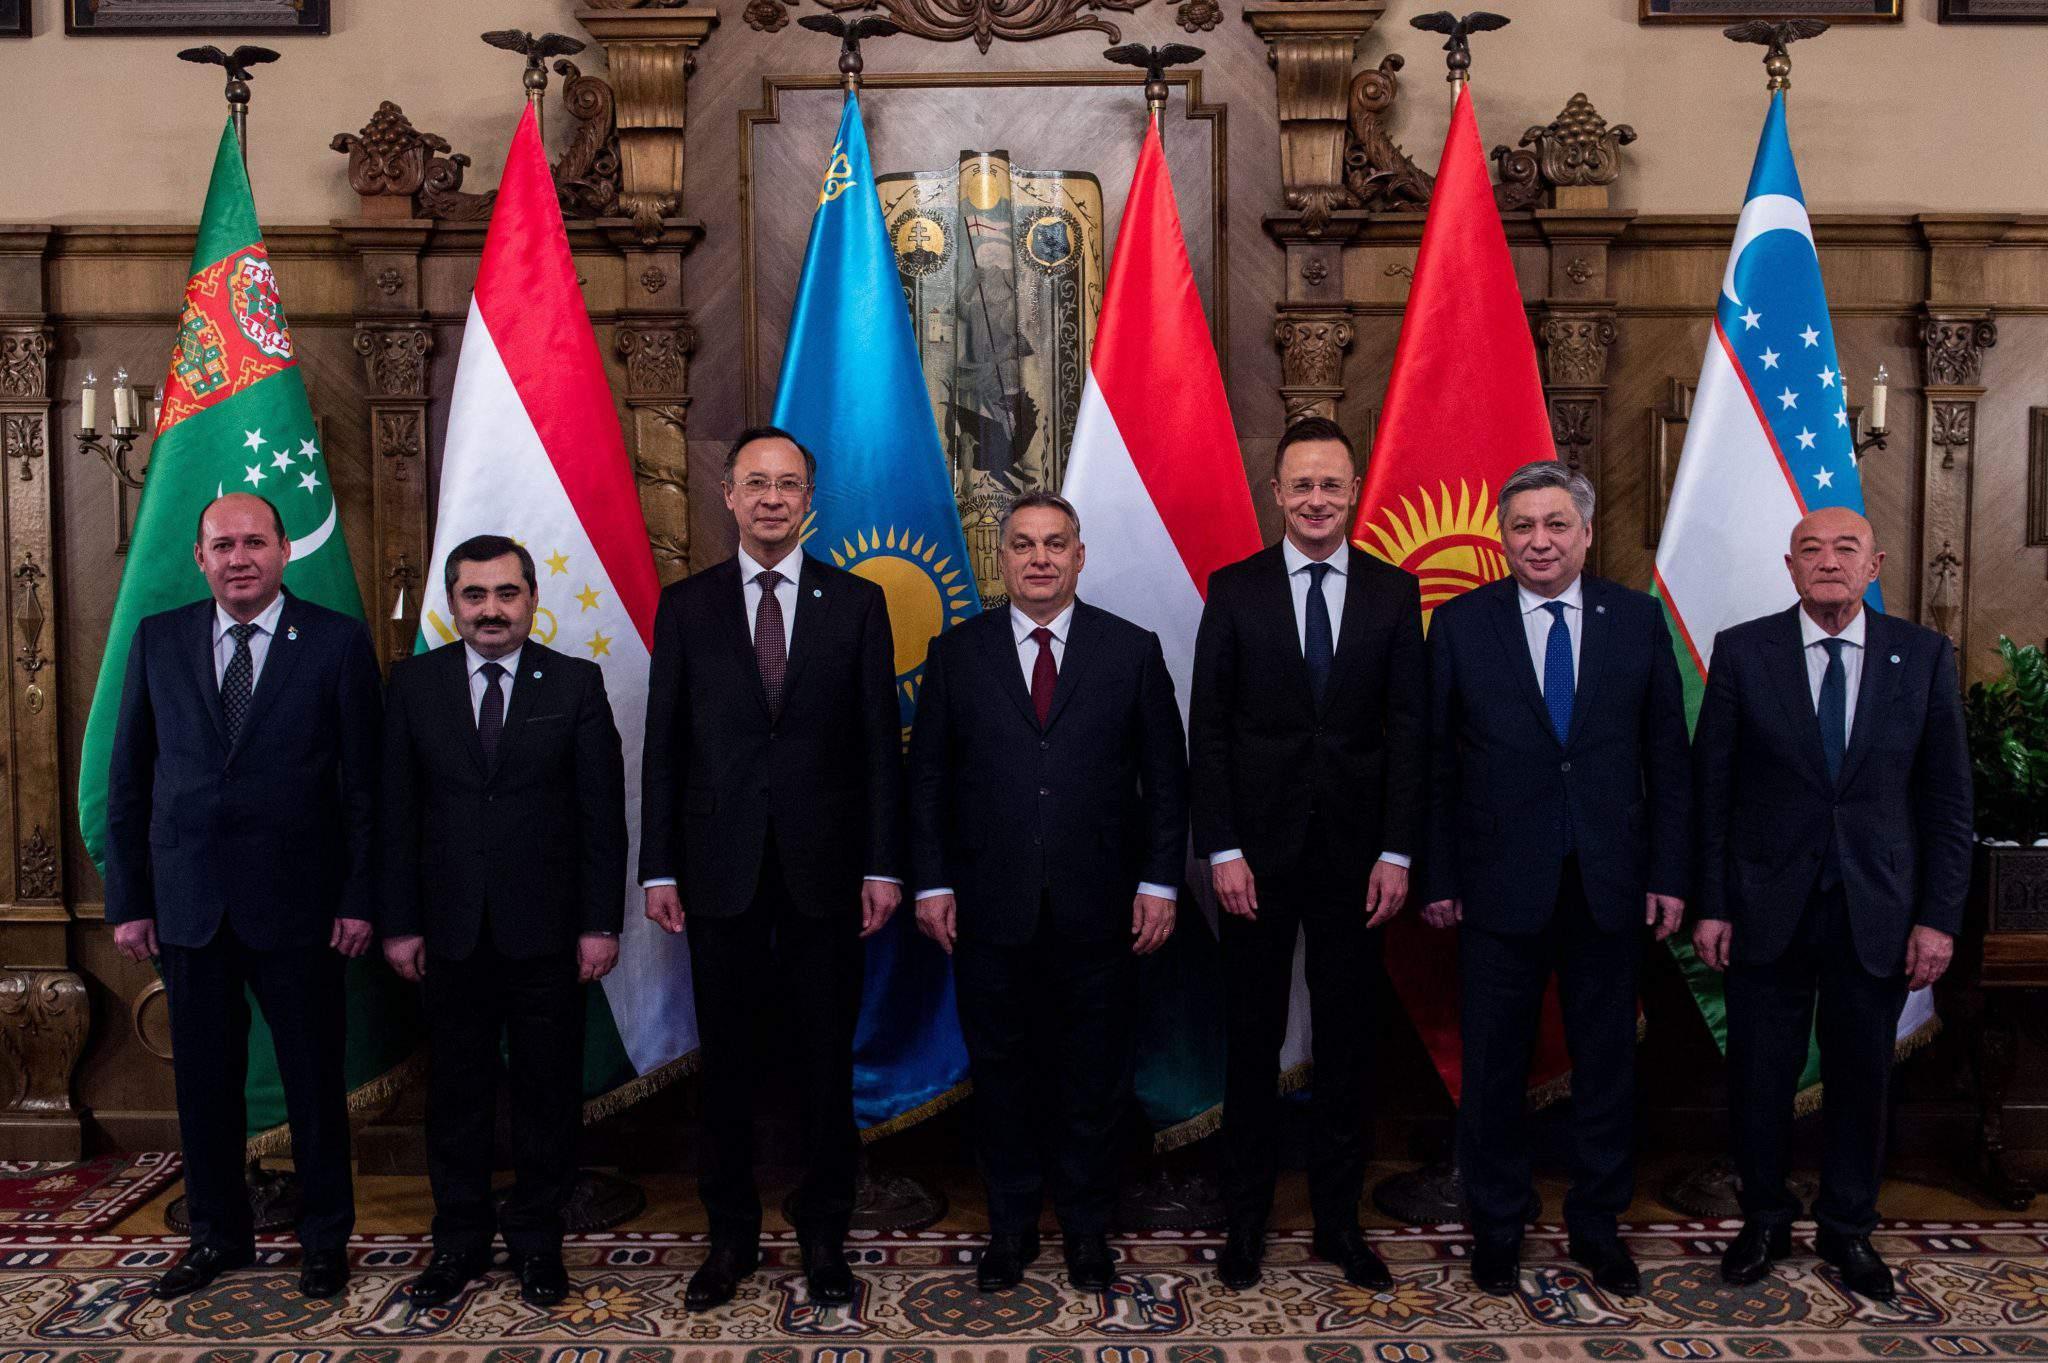 Visegrád Four Central Asia